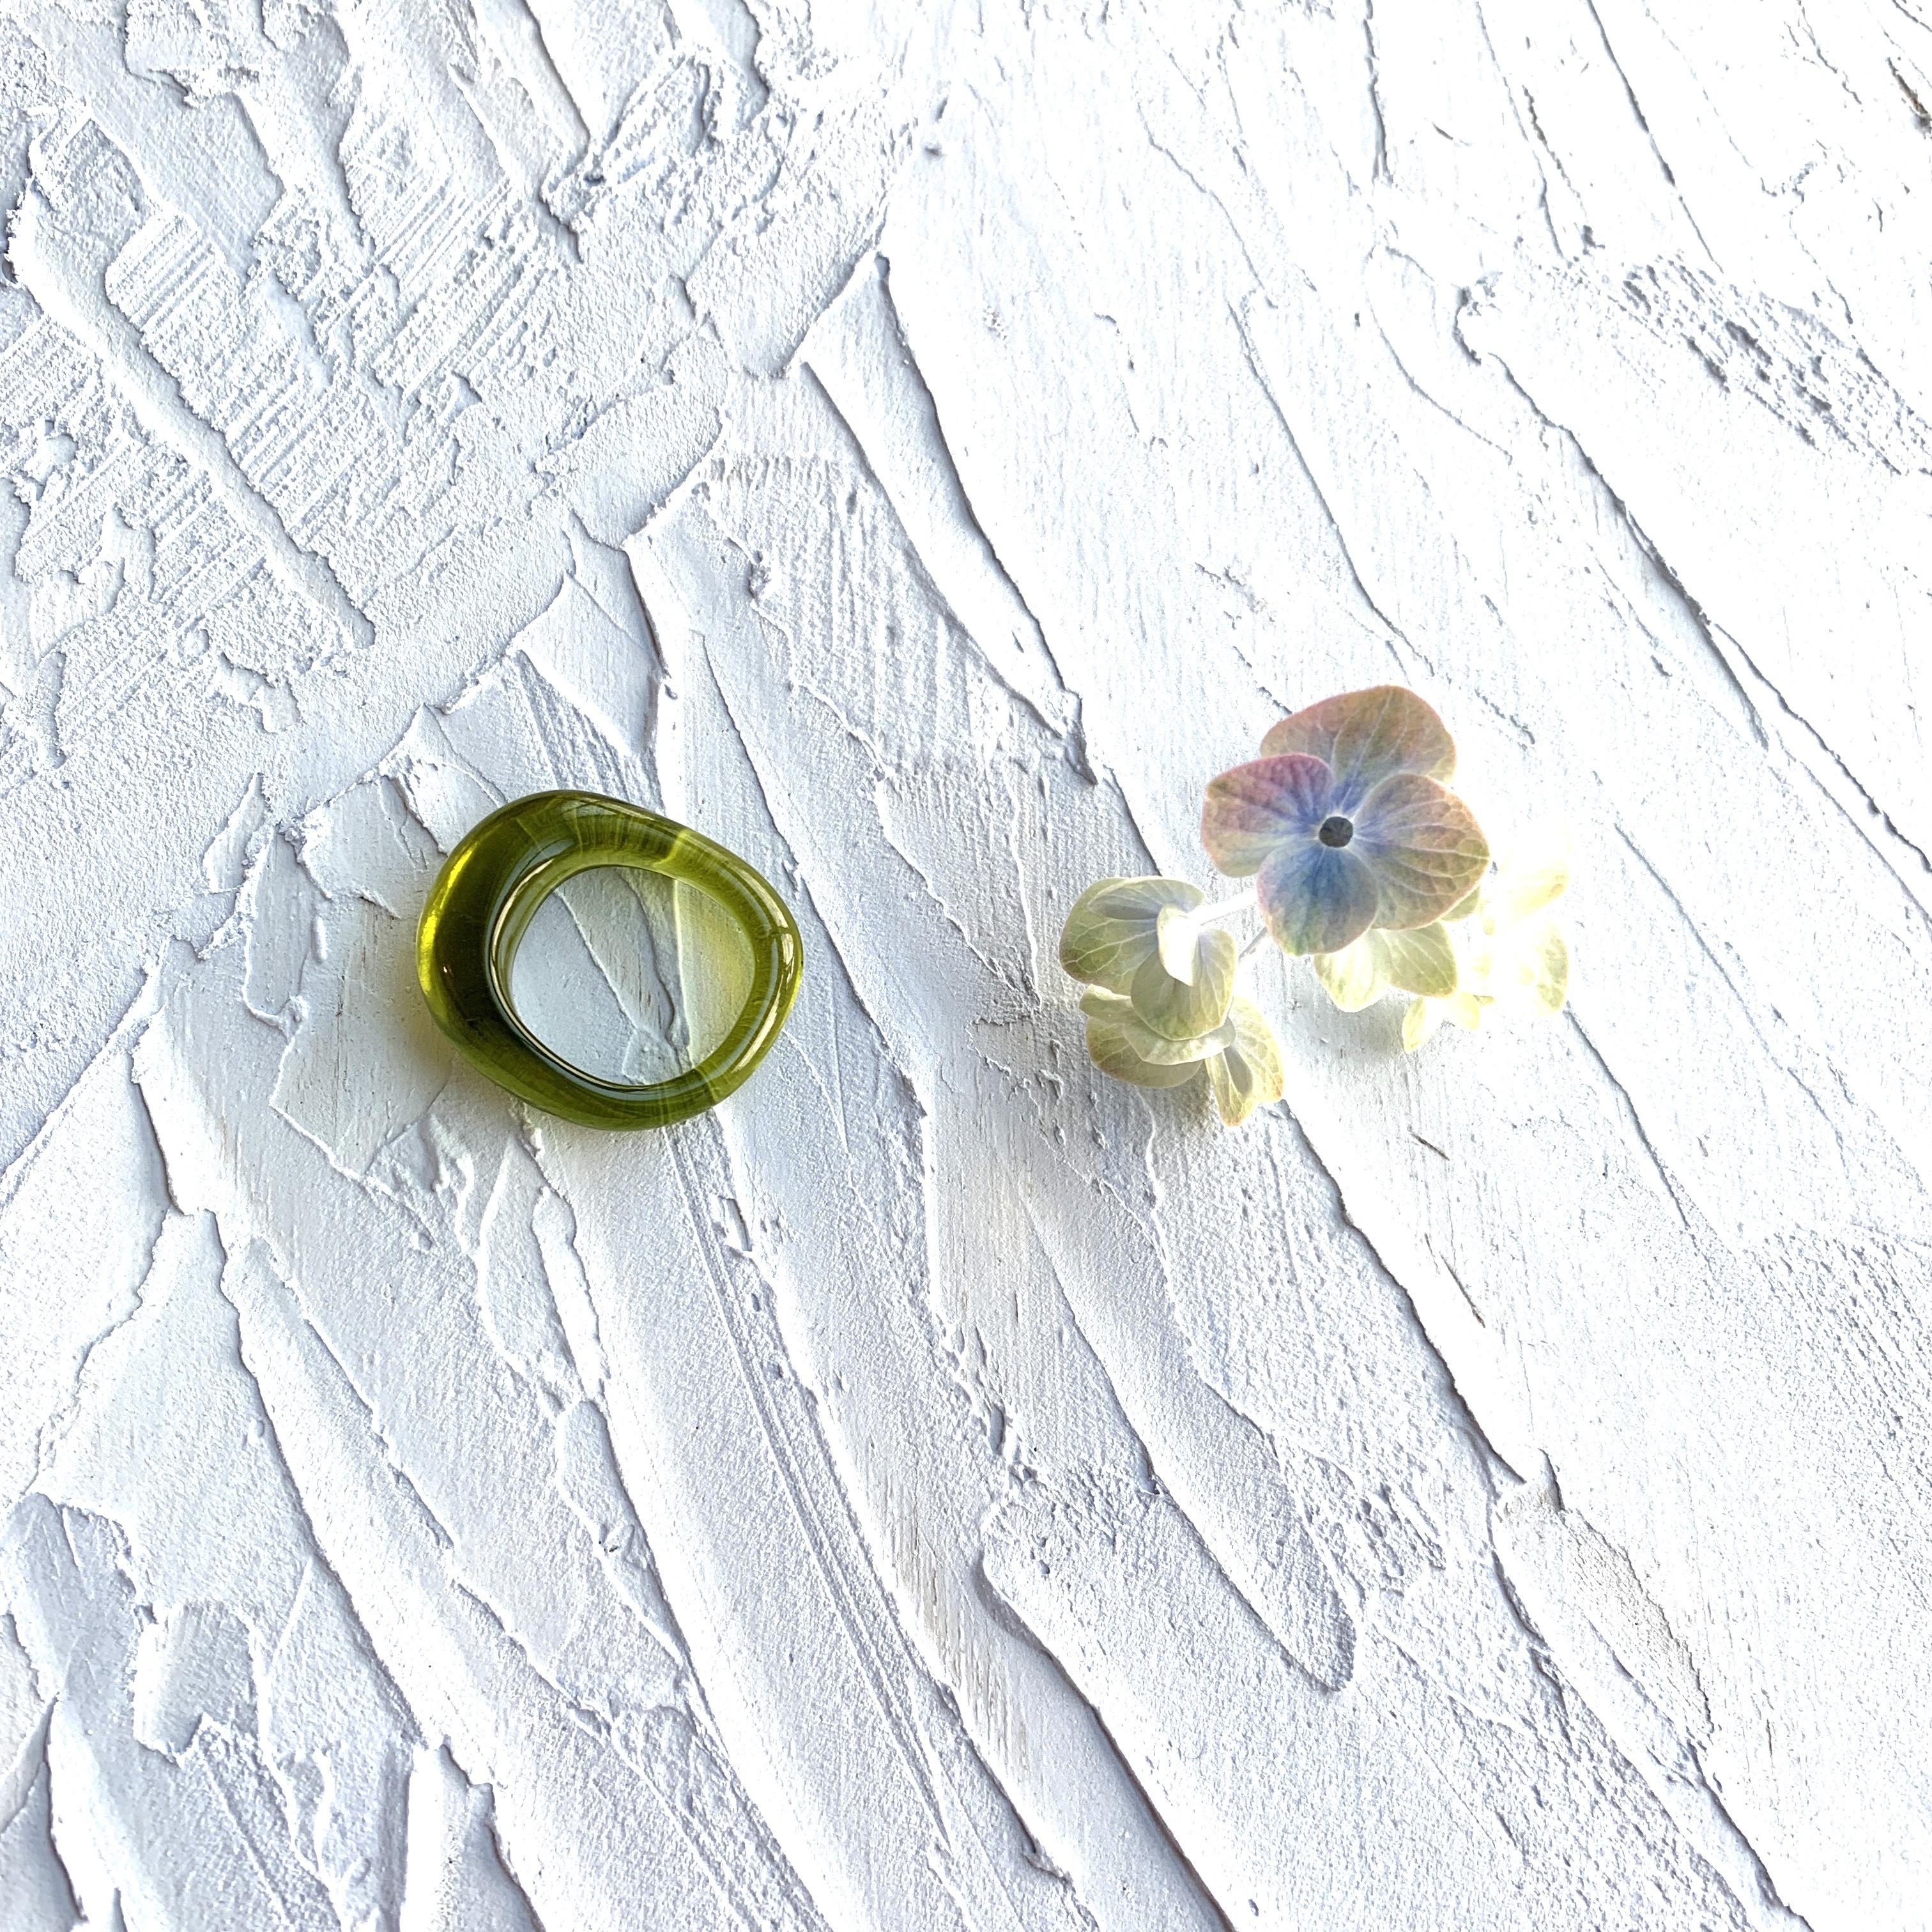 Oval clea Ring |オーバルクリアリング・モスグリーン|#sp0172 |【STELLAPARK】